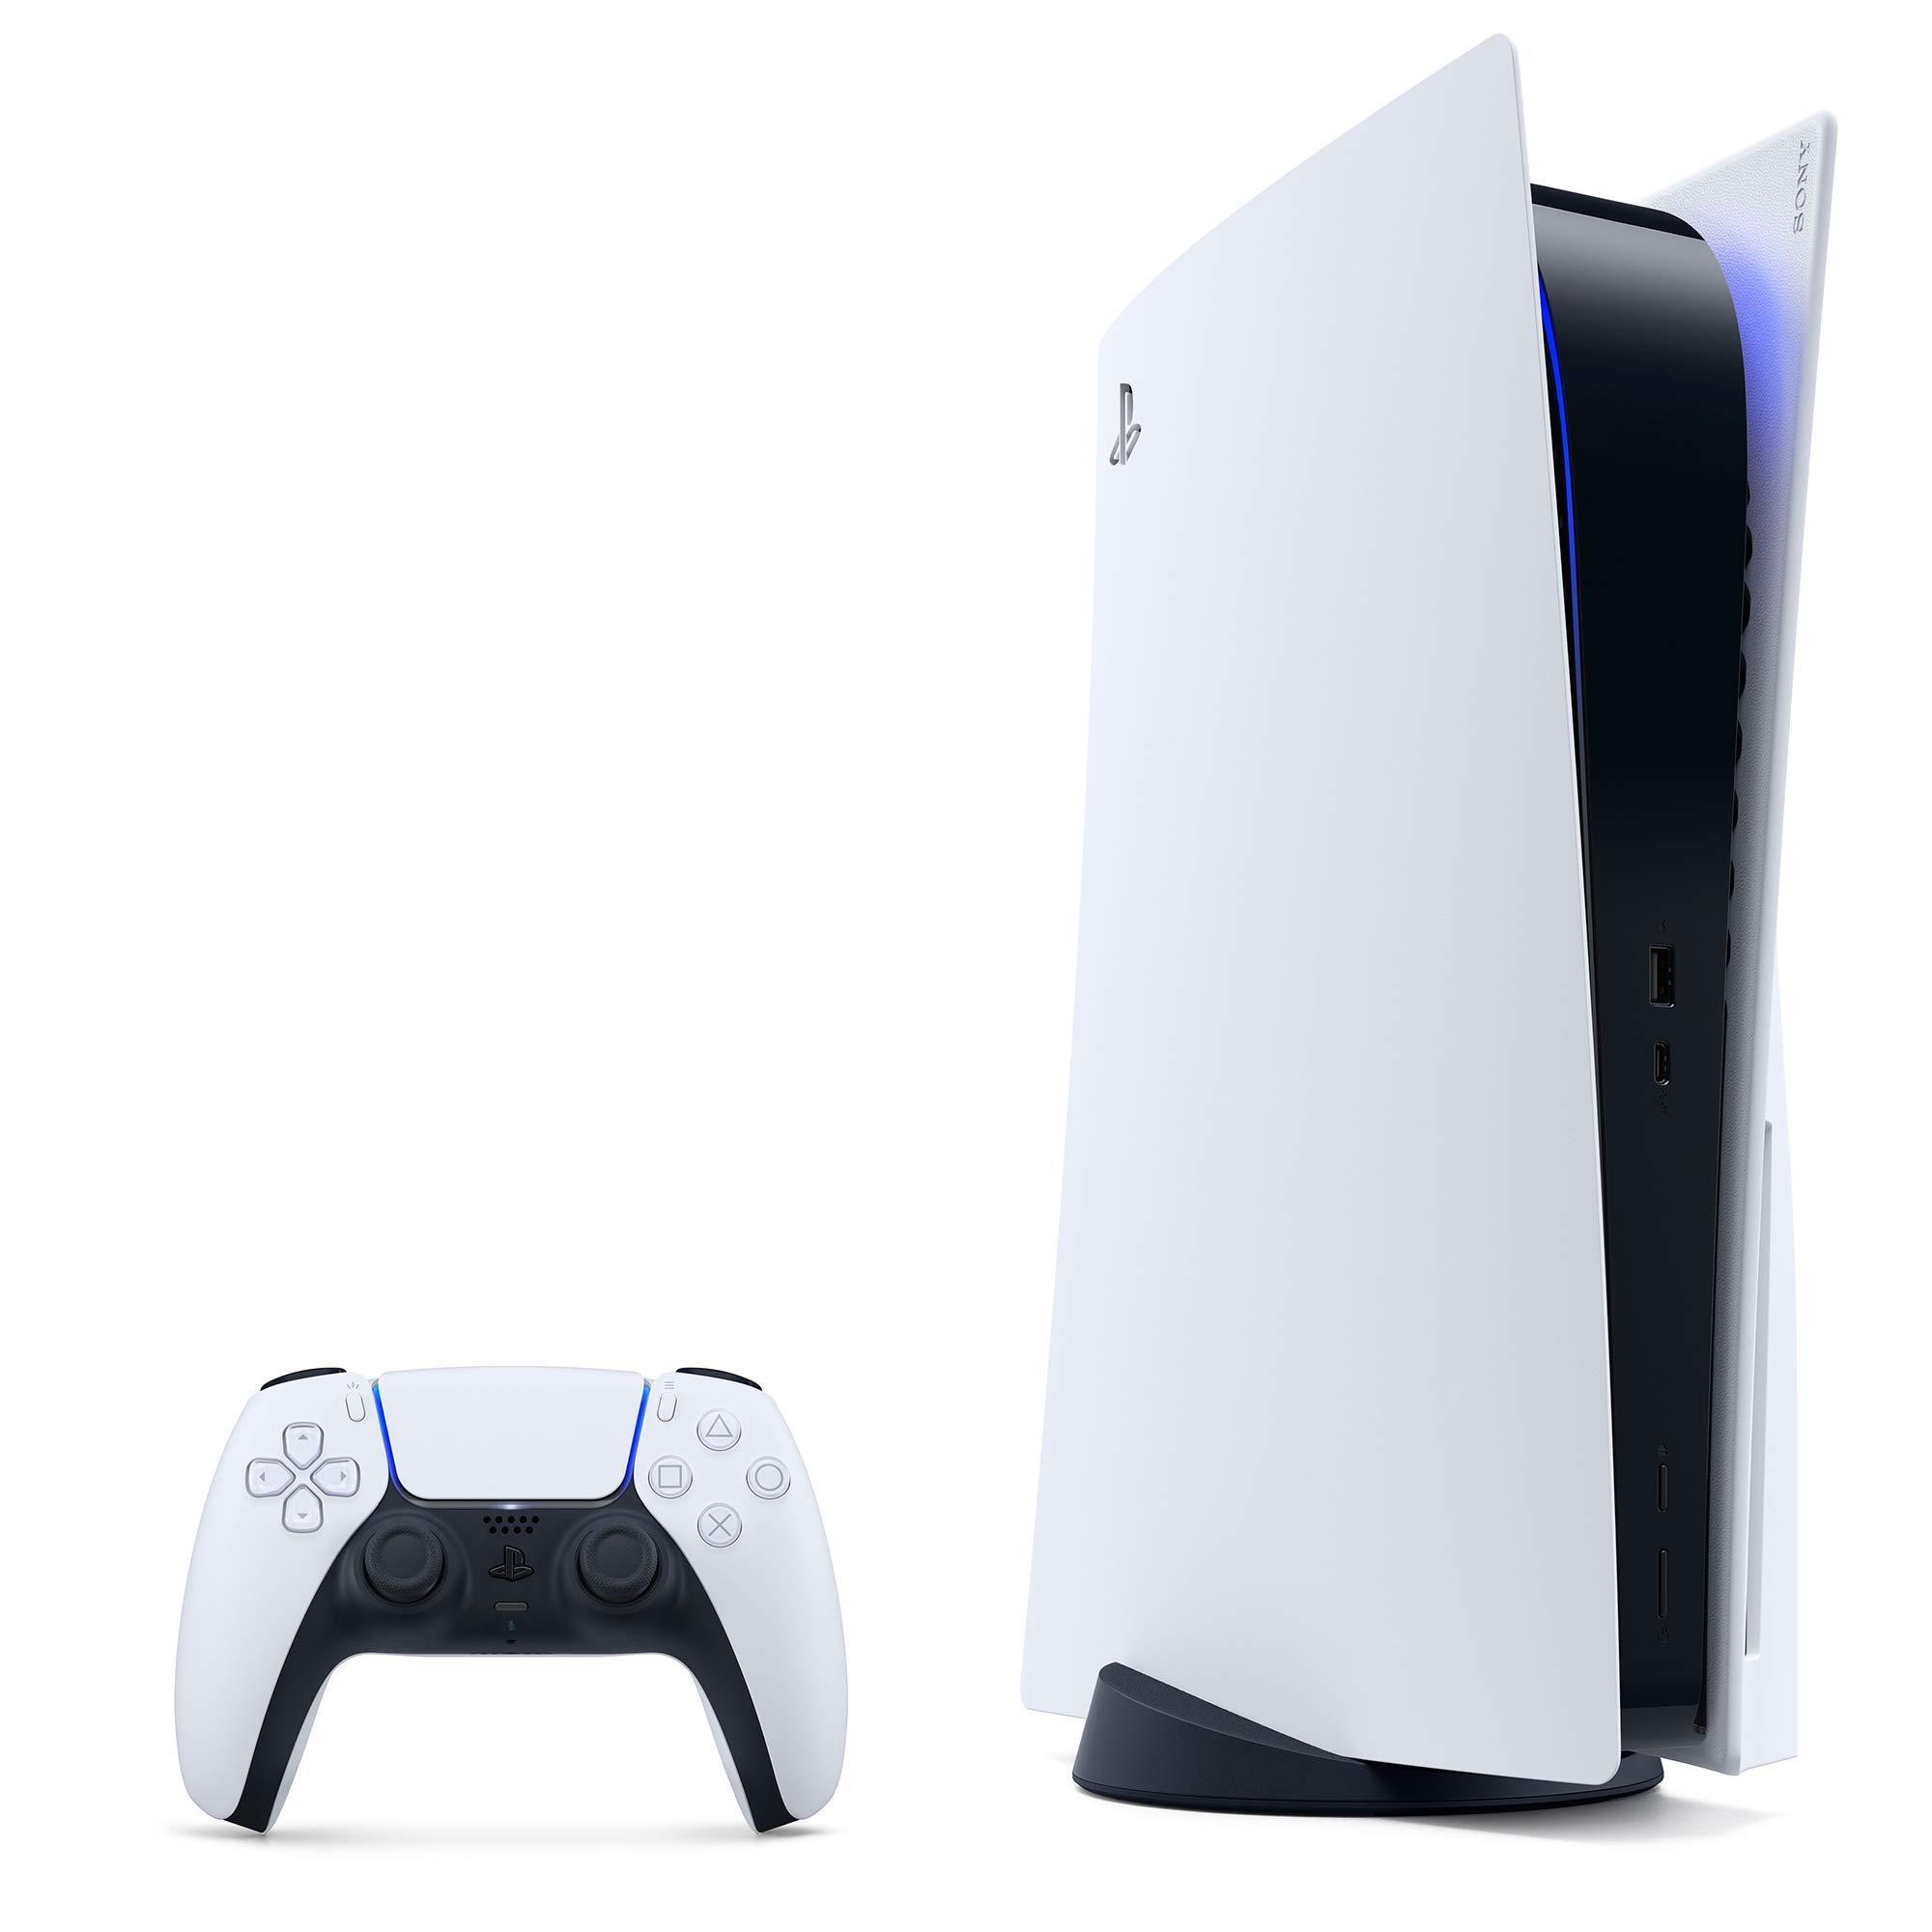 【PS5】『プレイステーション 5』本体、の抽選販売【ジョーシン】店舗受取 PlayStation 5